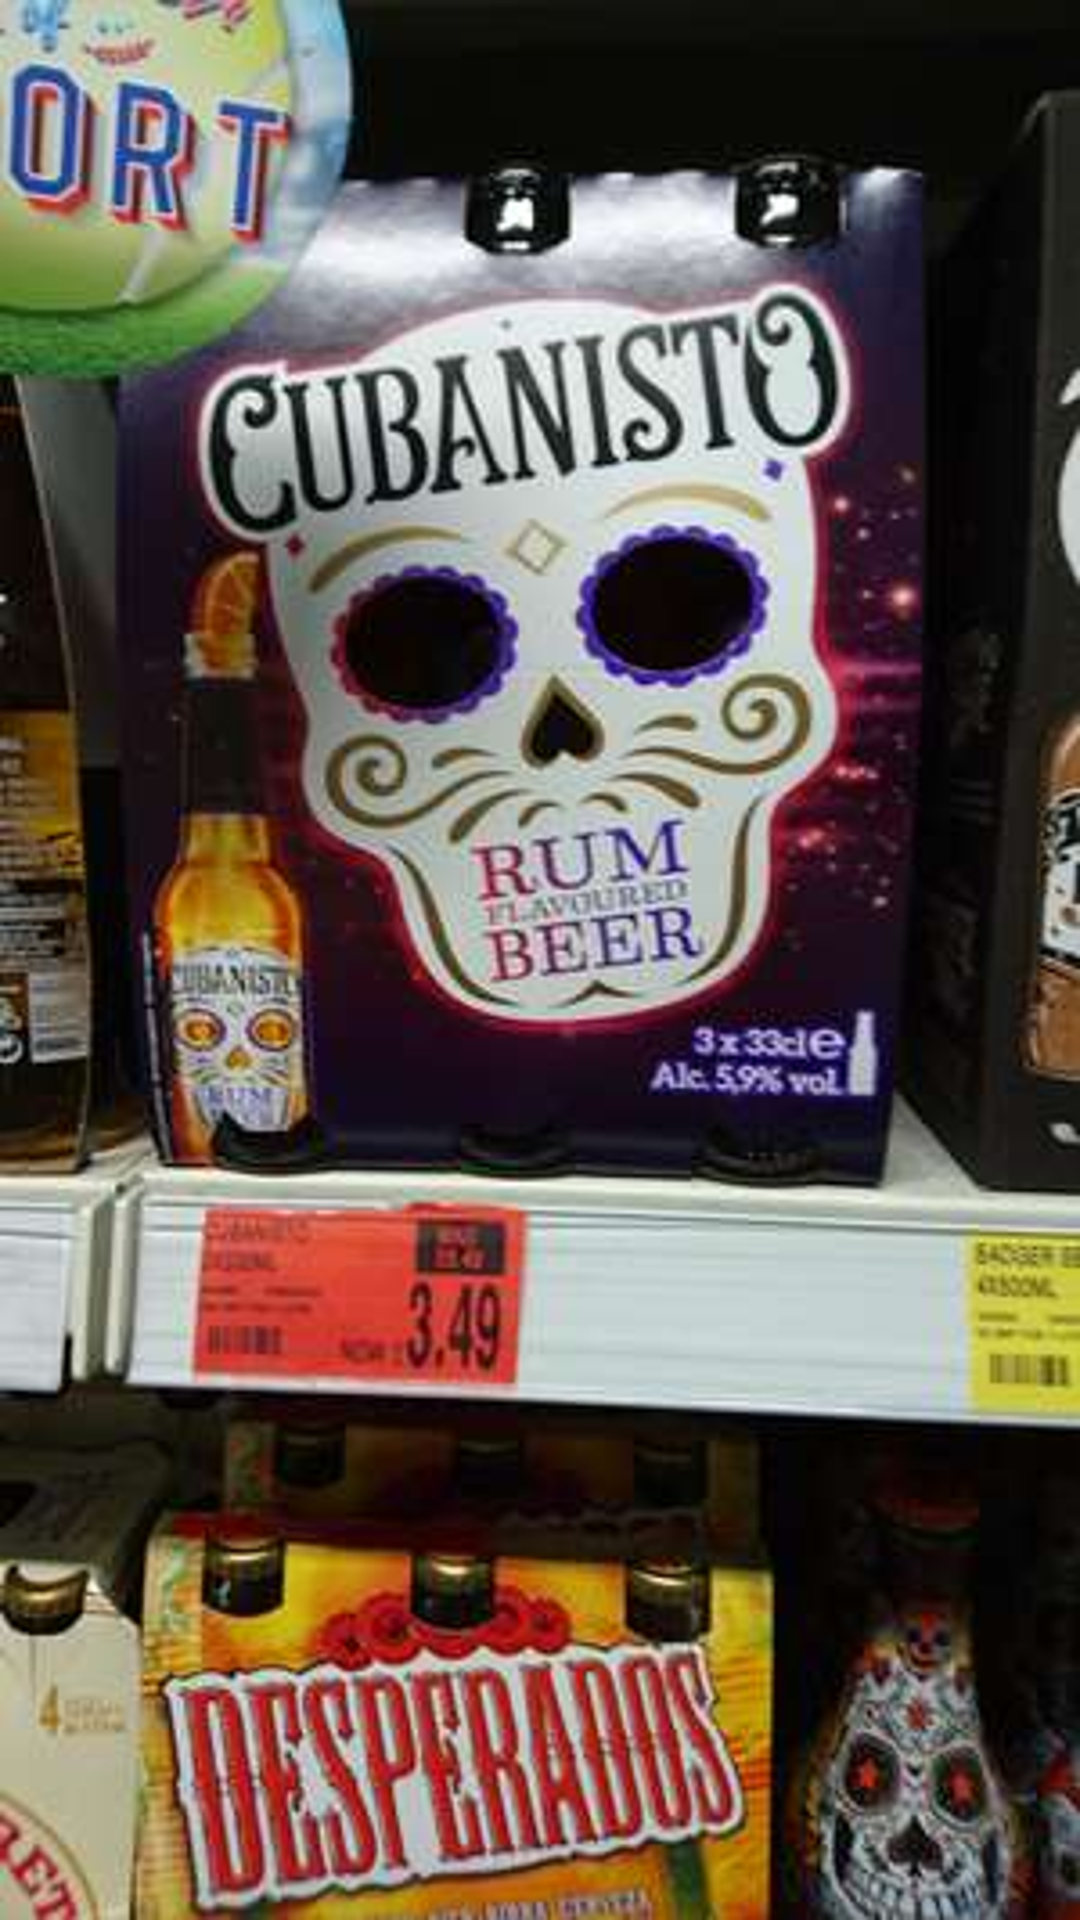 Cubanisto rum flavour beer 3 x 33cl £3.49 @ b&m / Birkenhead